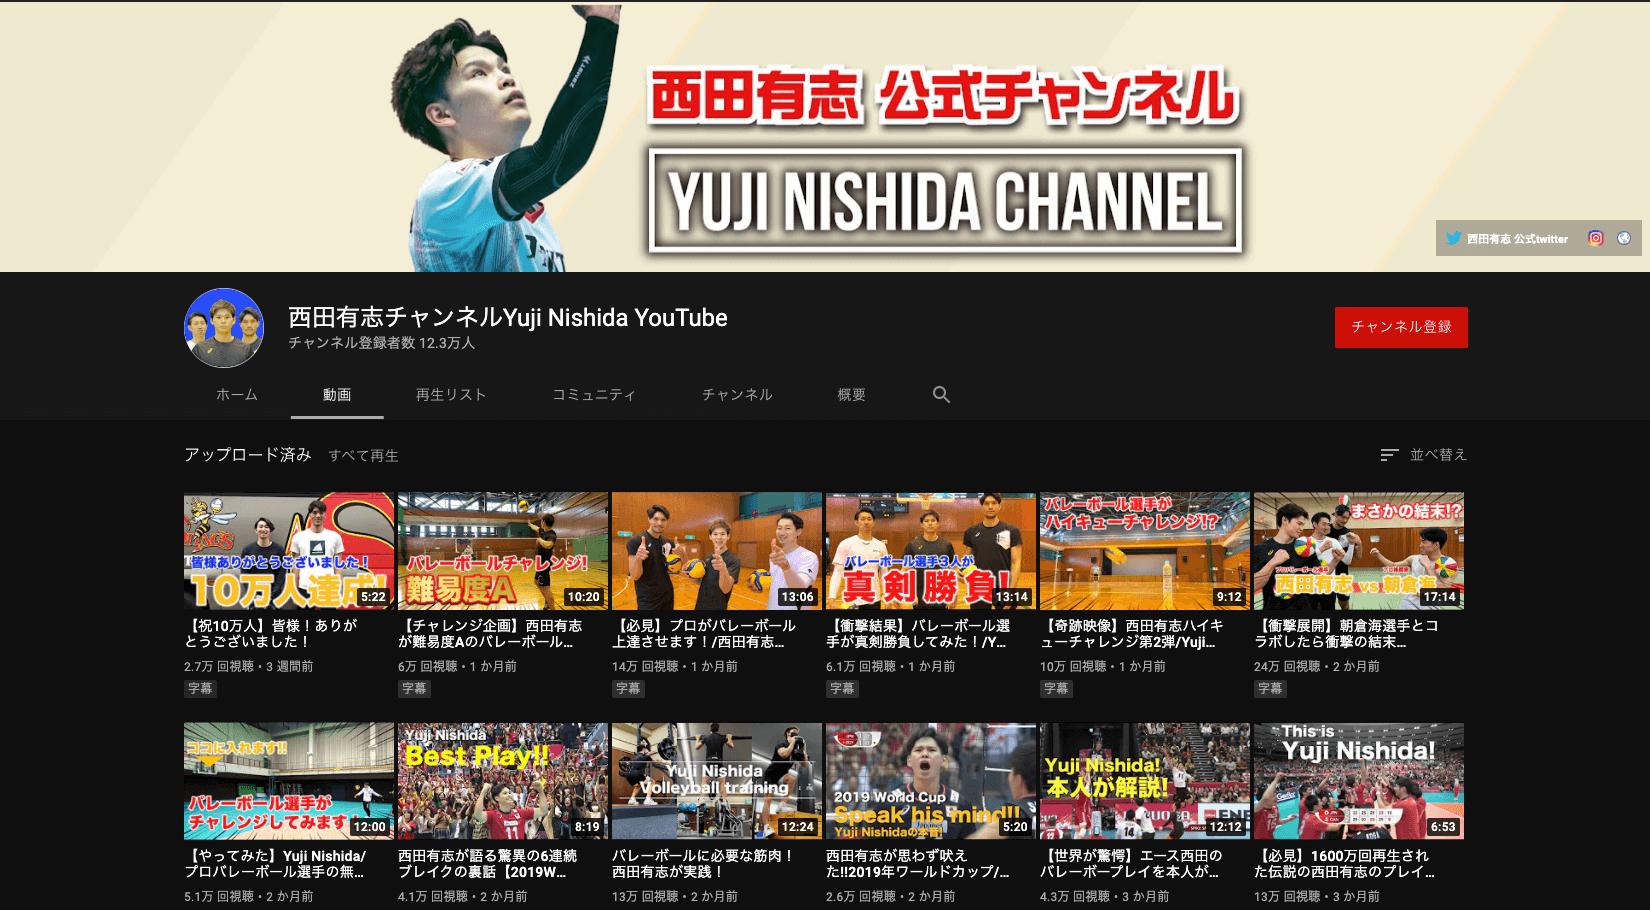 youtube_volleyball_yuji nishida